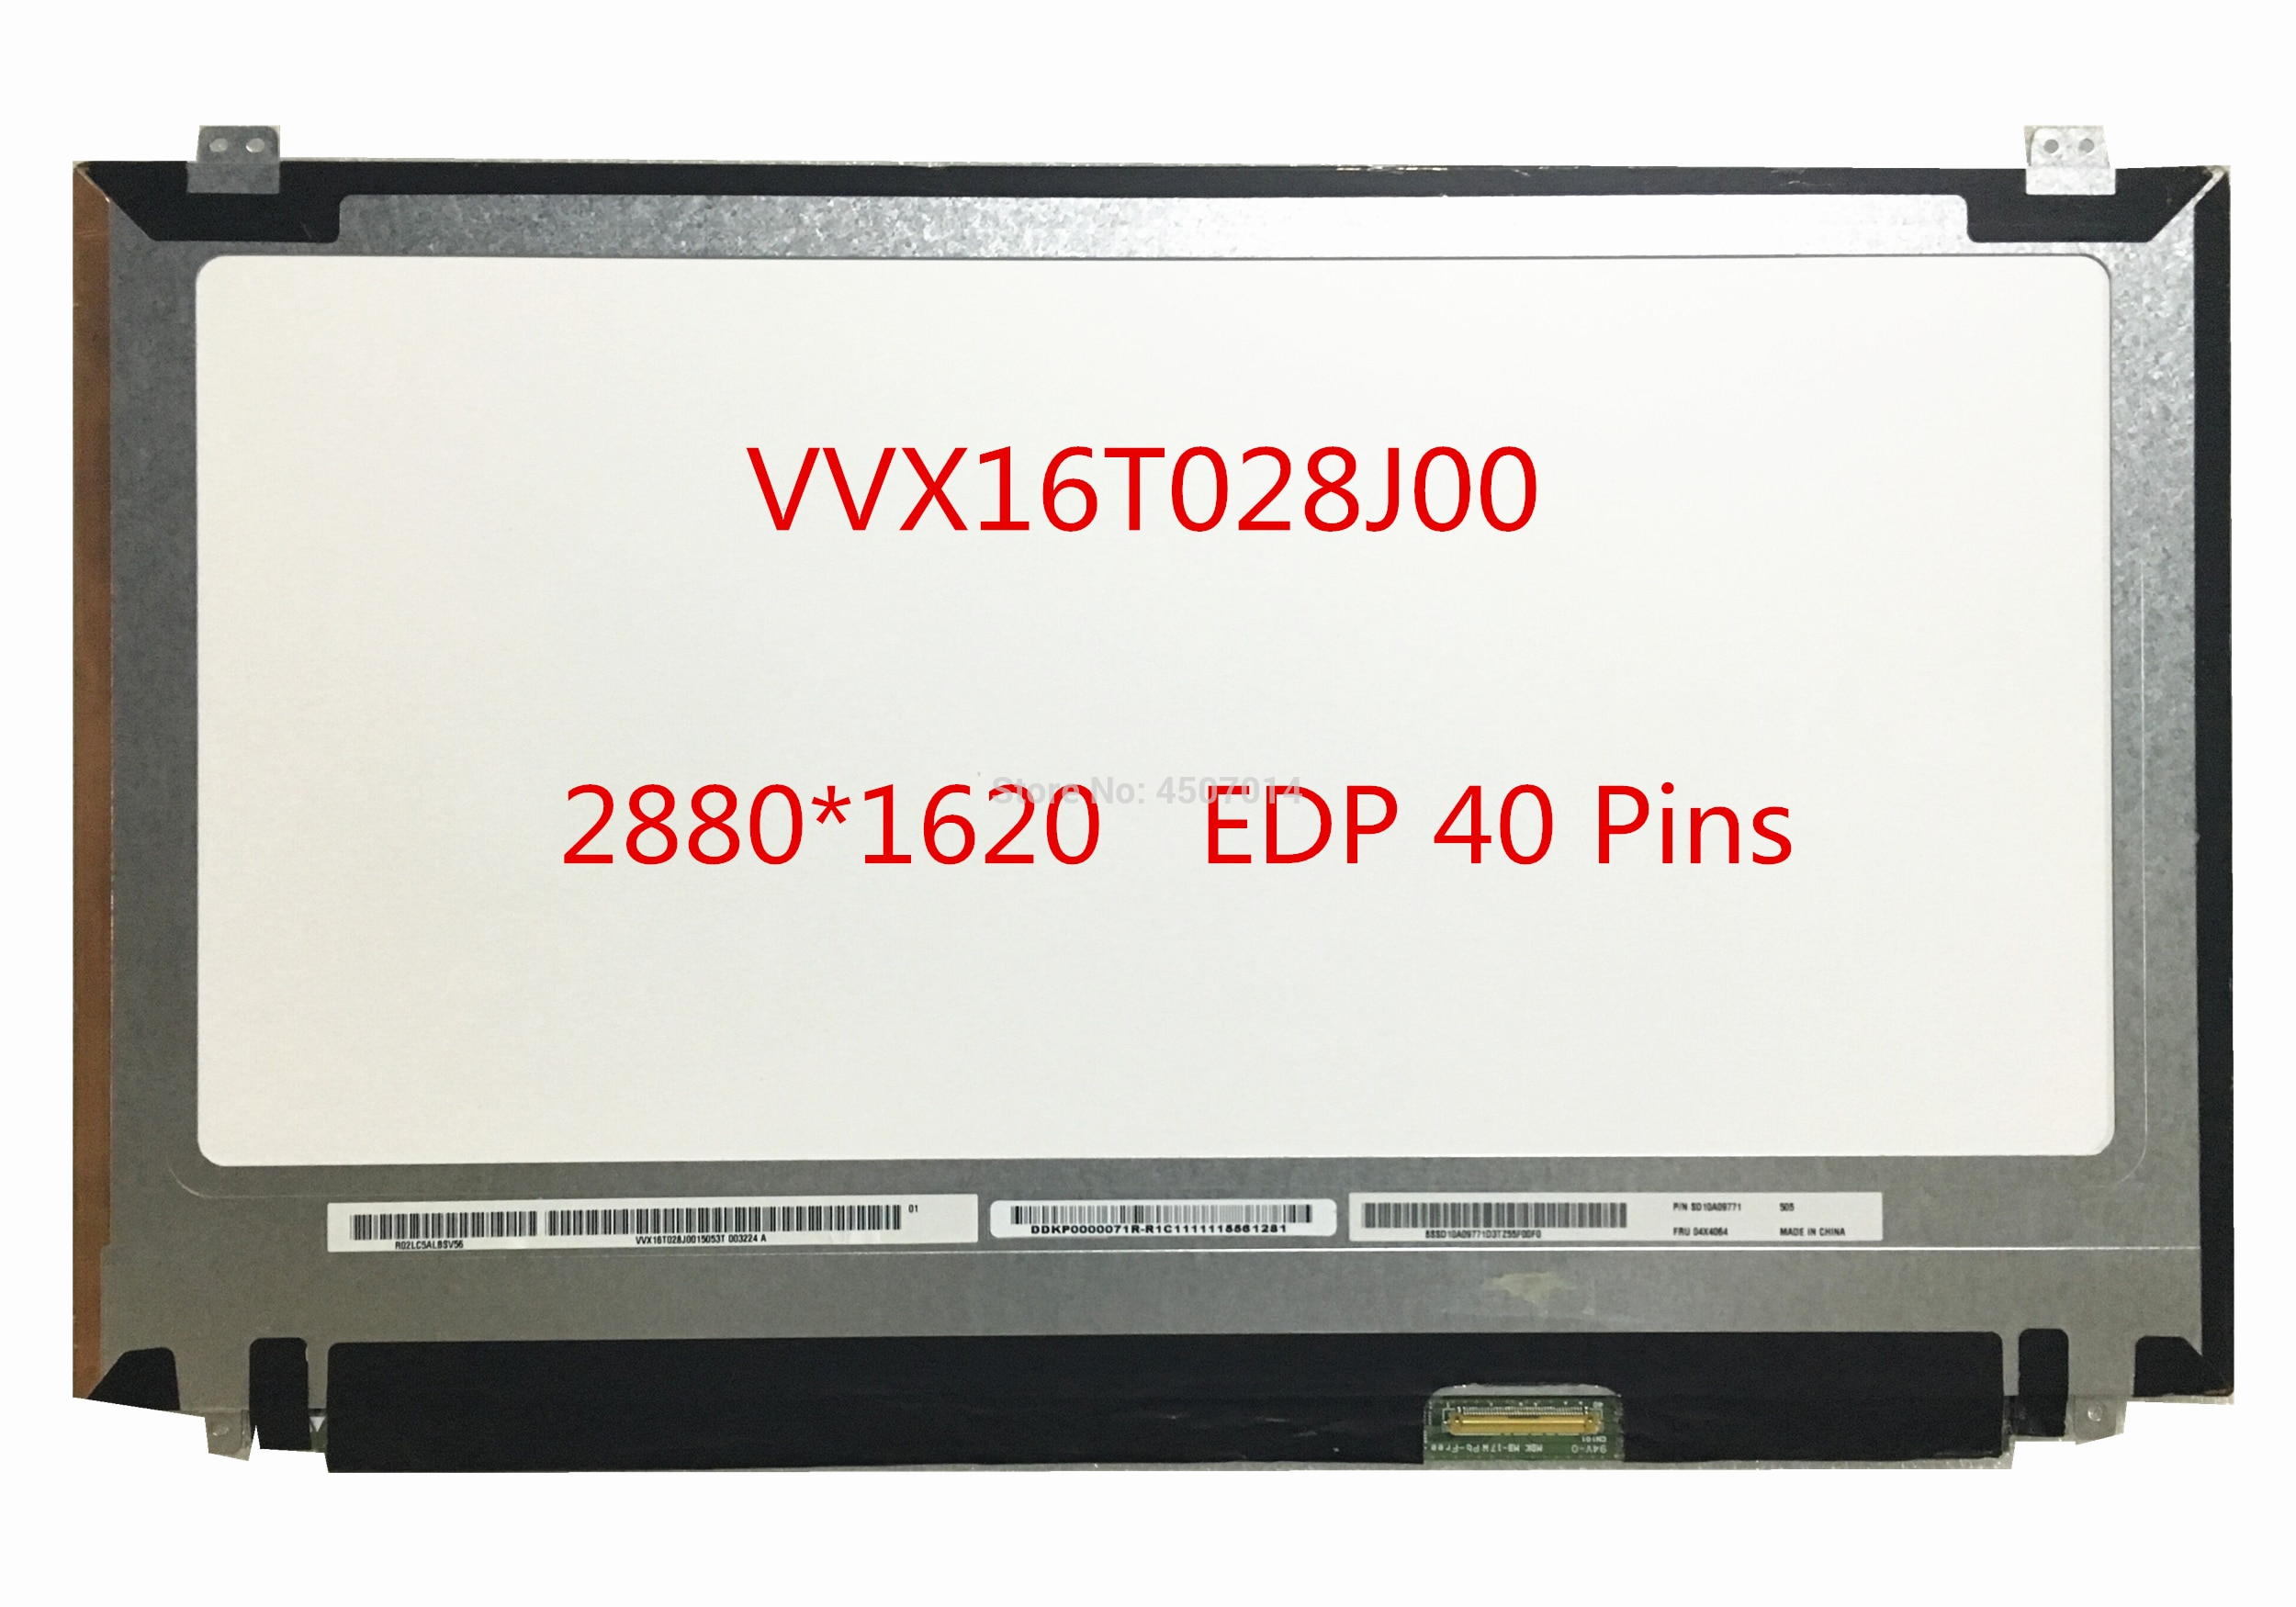 Frete Grátis VVX16T028J00 apto para Lenovo W540 W540P W550S T550 Laptop Tela Lcd 2880*1620 EDP 40 Pinos